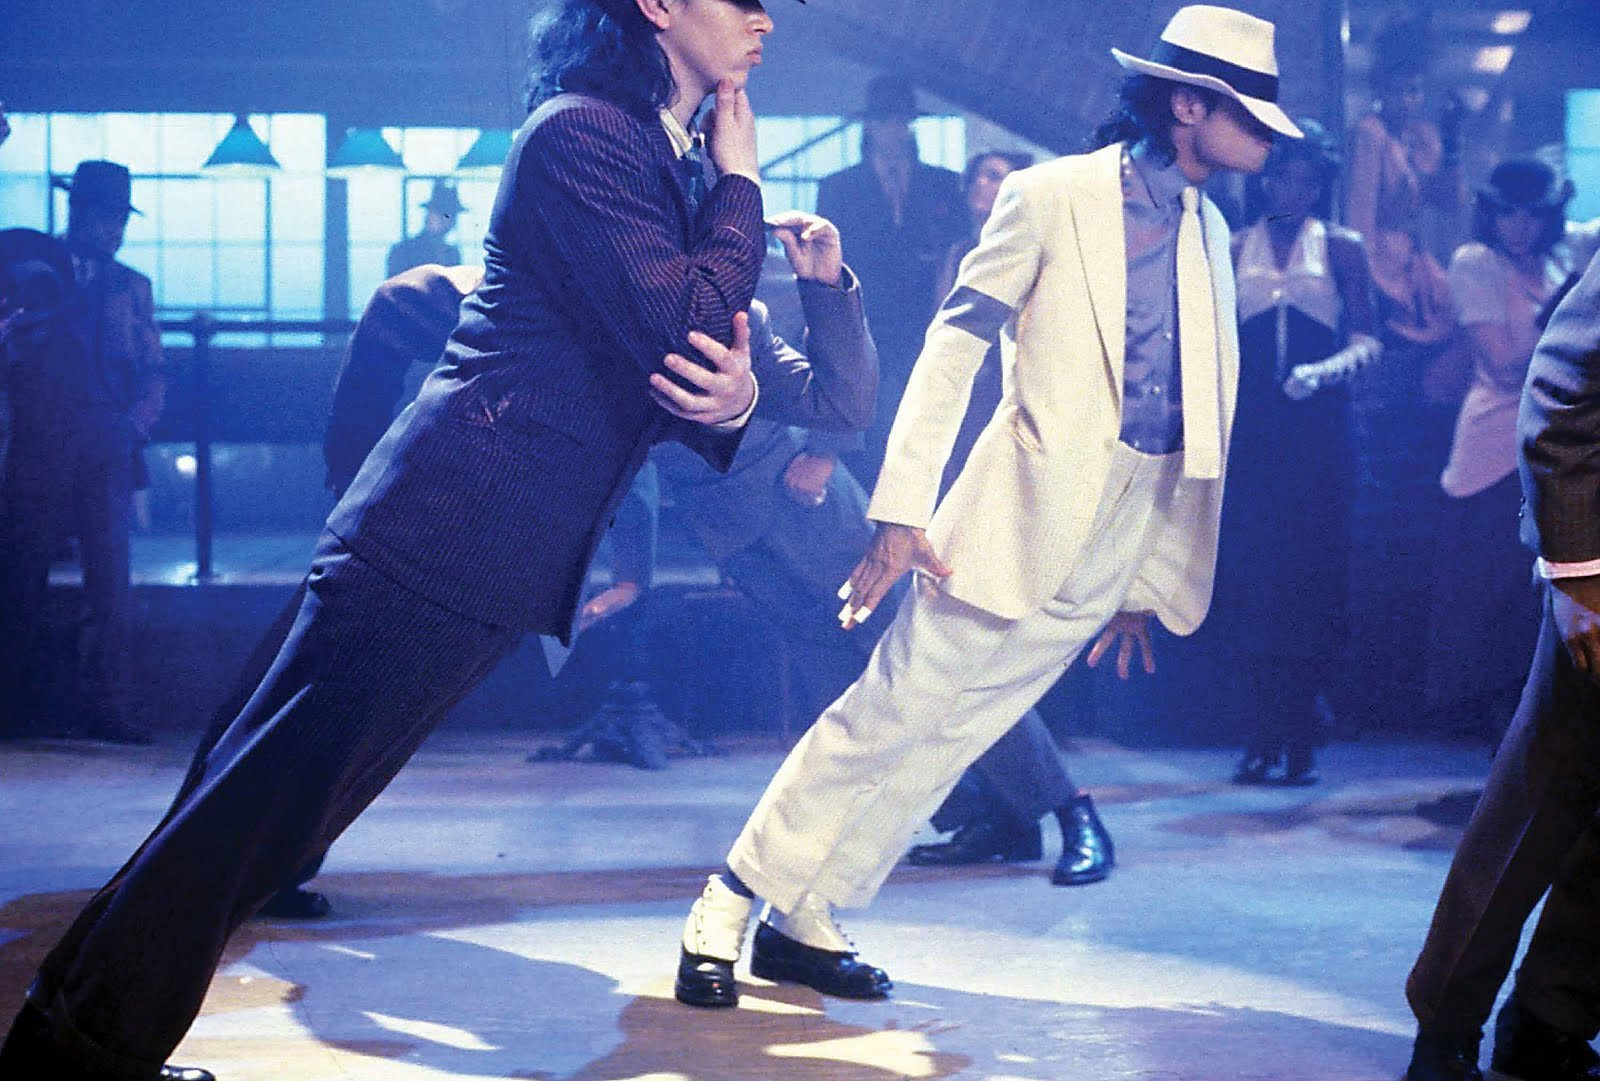 Ngoi sao Hollywood la nhung nha phat minh - Michael Jackson 1 - elleman